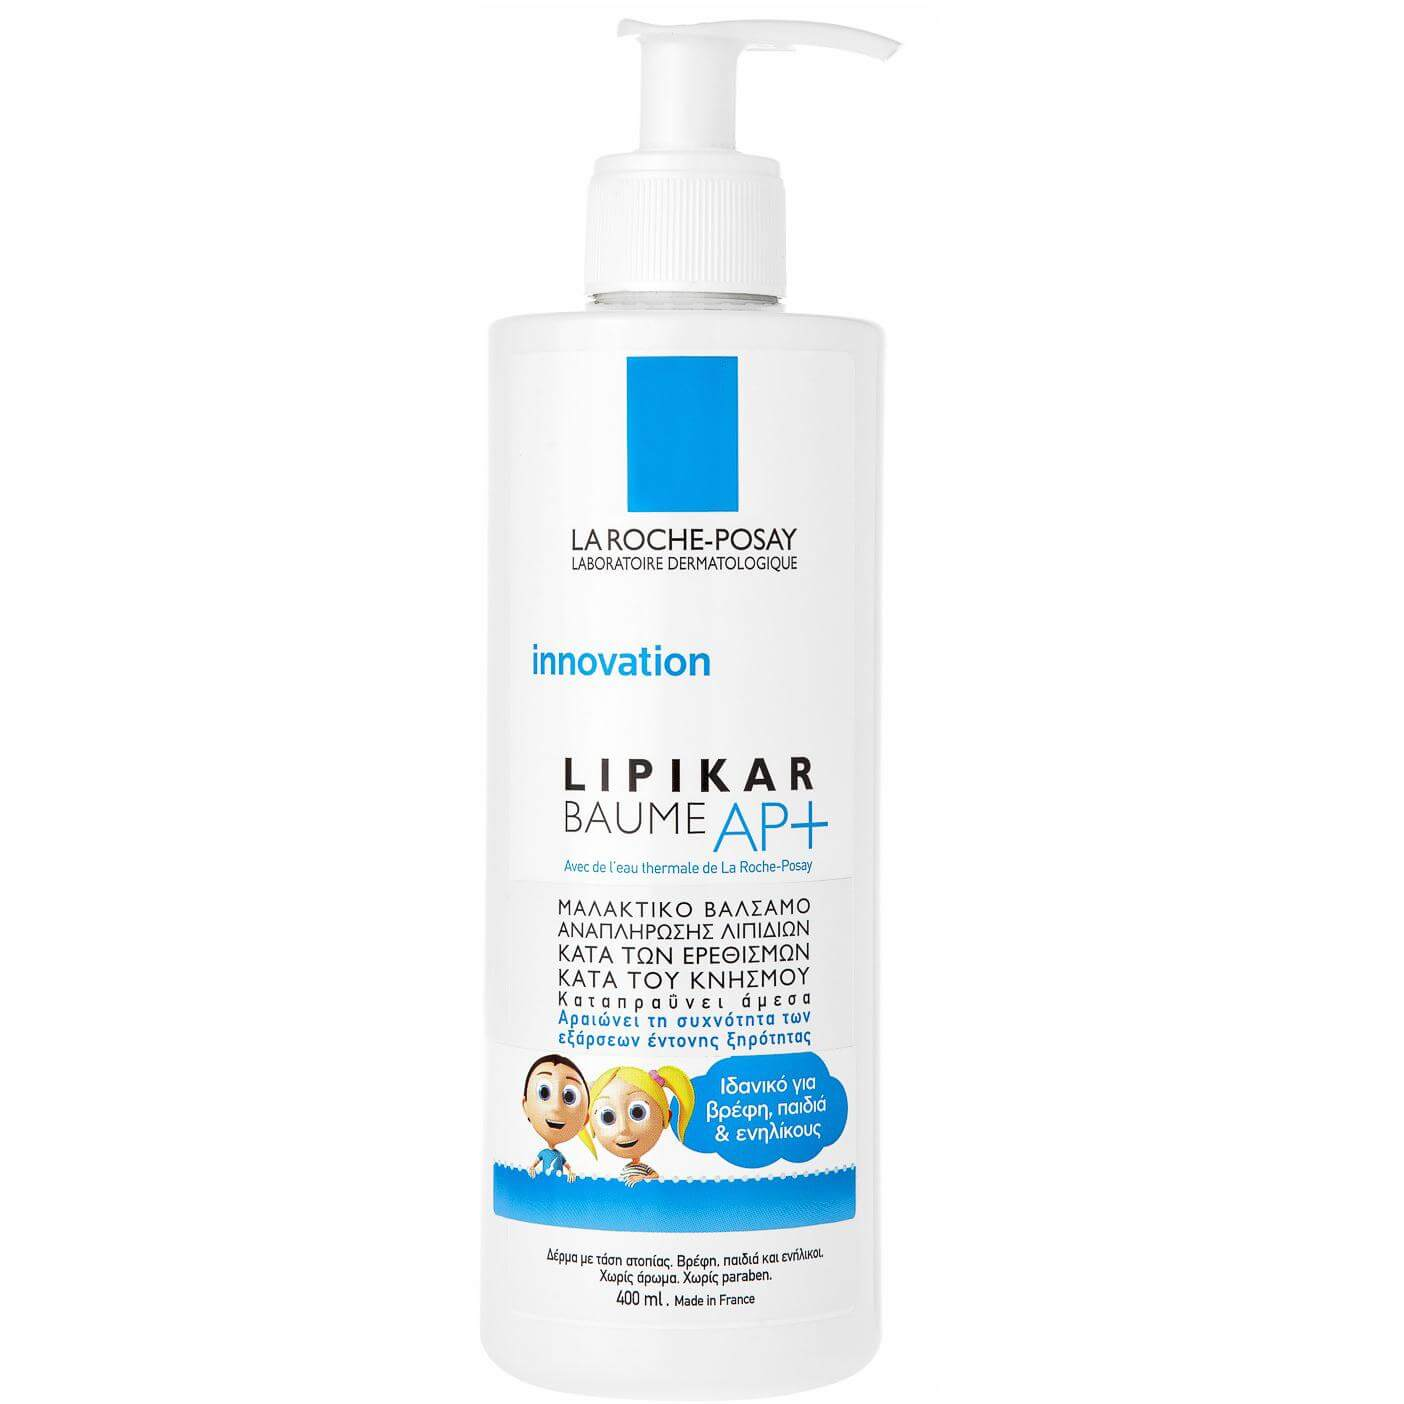 La Roche-Posay Lipikar Baume ΑP Μαλακτικό Βάλσαμο Αναπλήρωσης των Λιπιδίων – 400ml